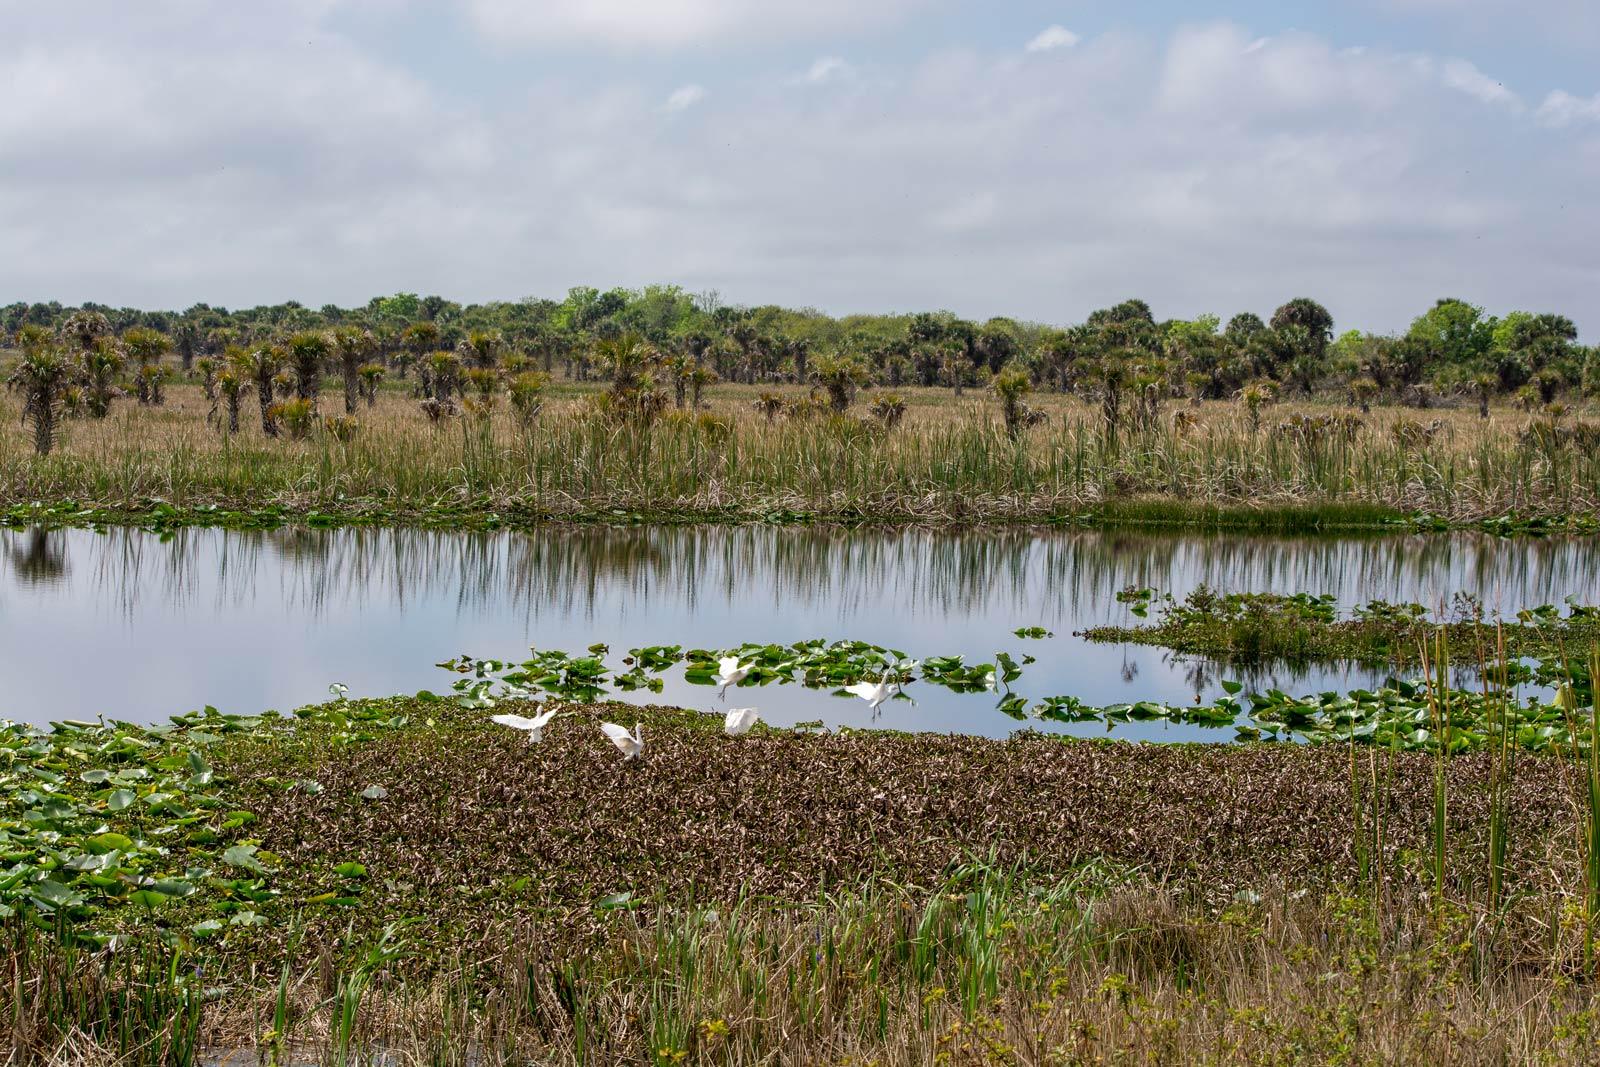 Birds hopping around in a marsh